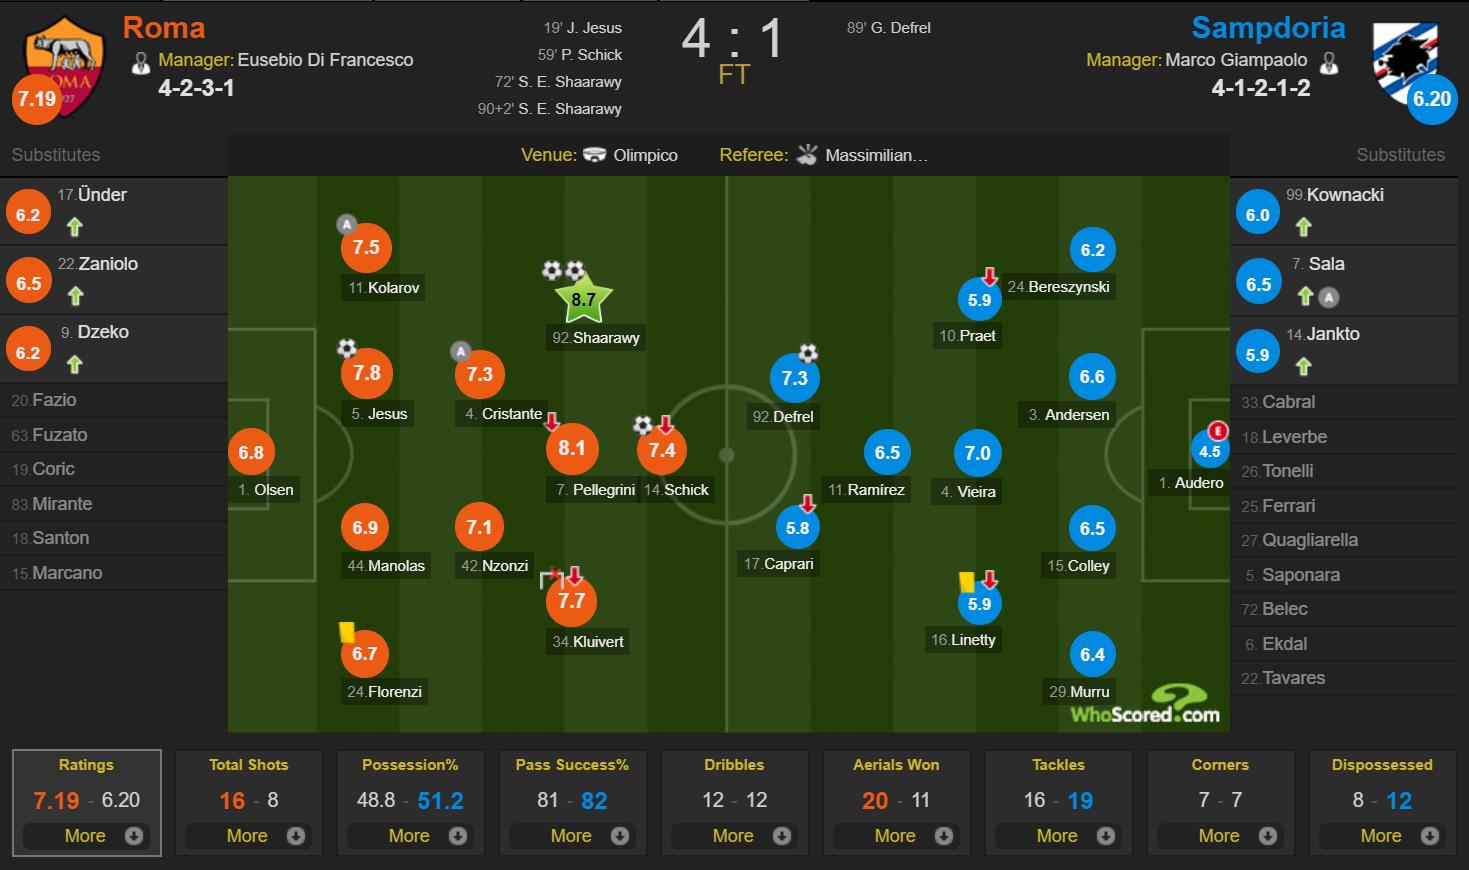 Roma vs Samdporia WhoScored raitings